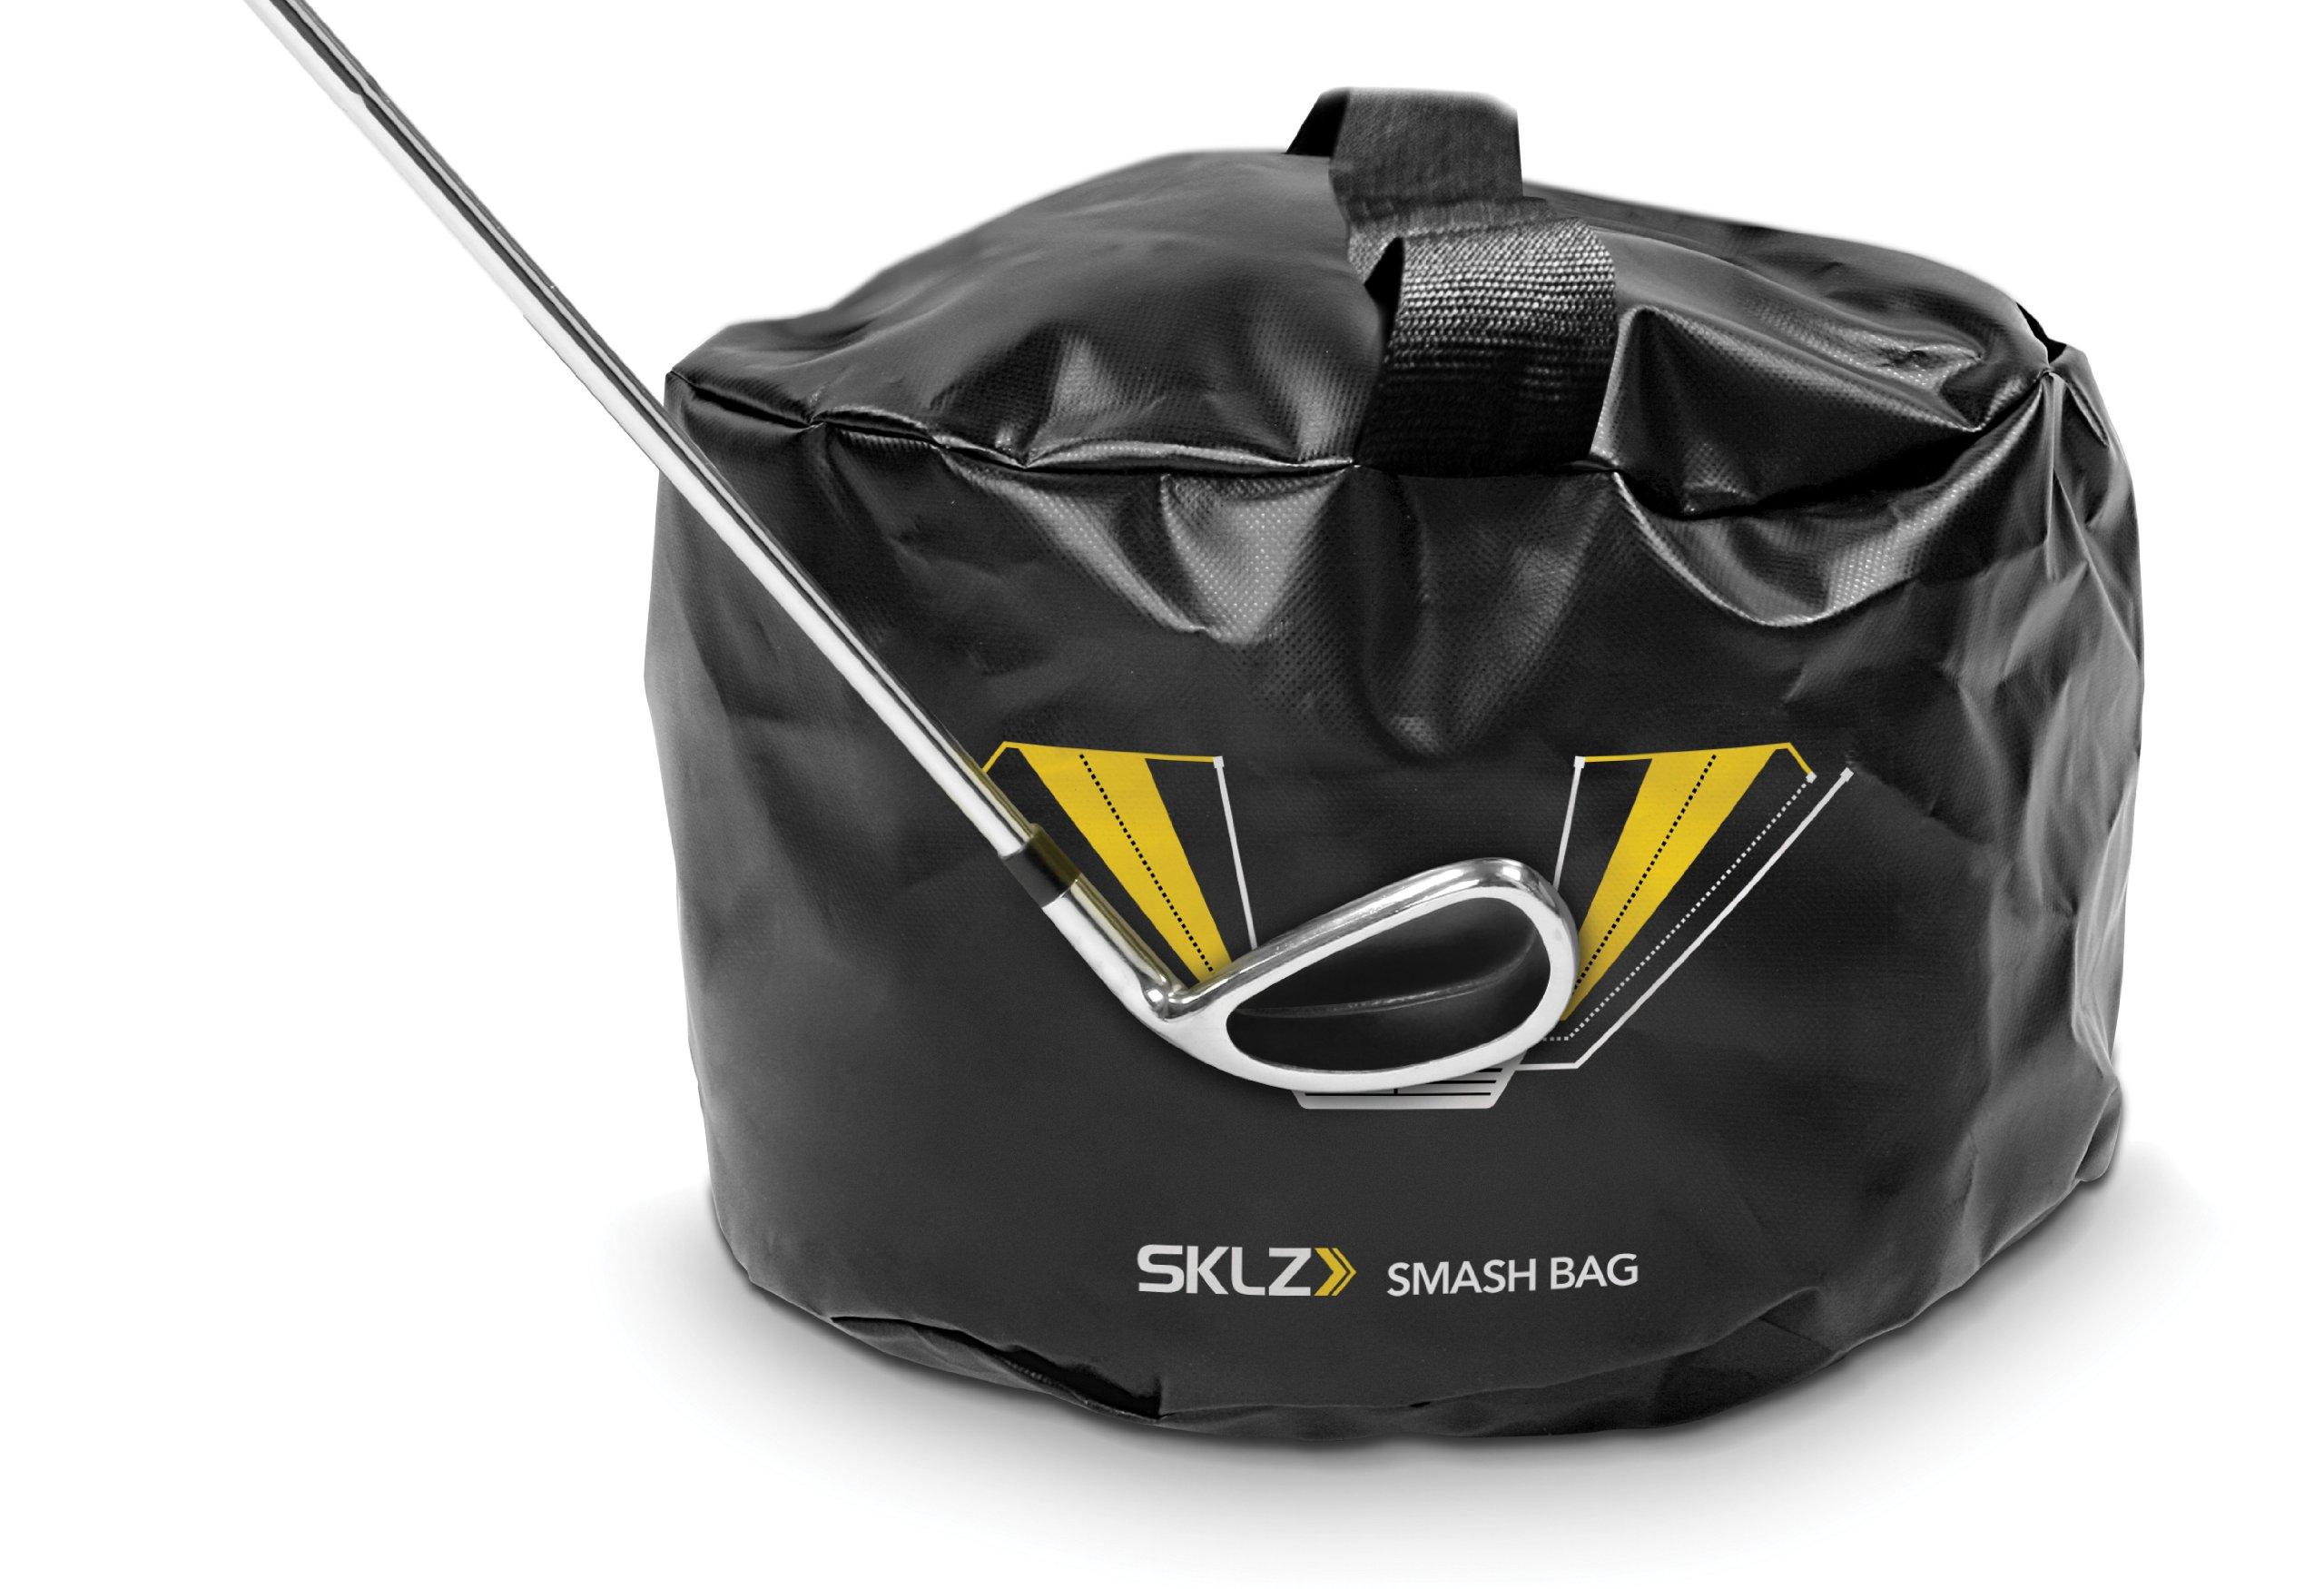 SKLZ Smash Impact Swing Trainer